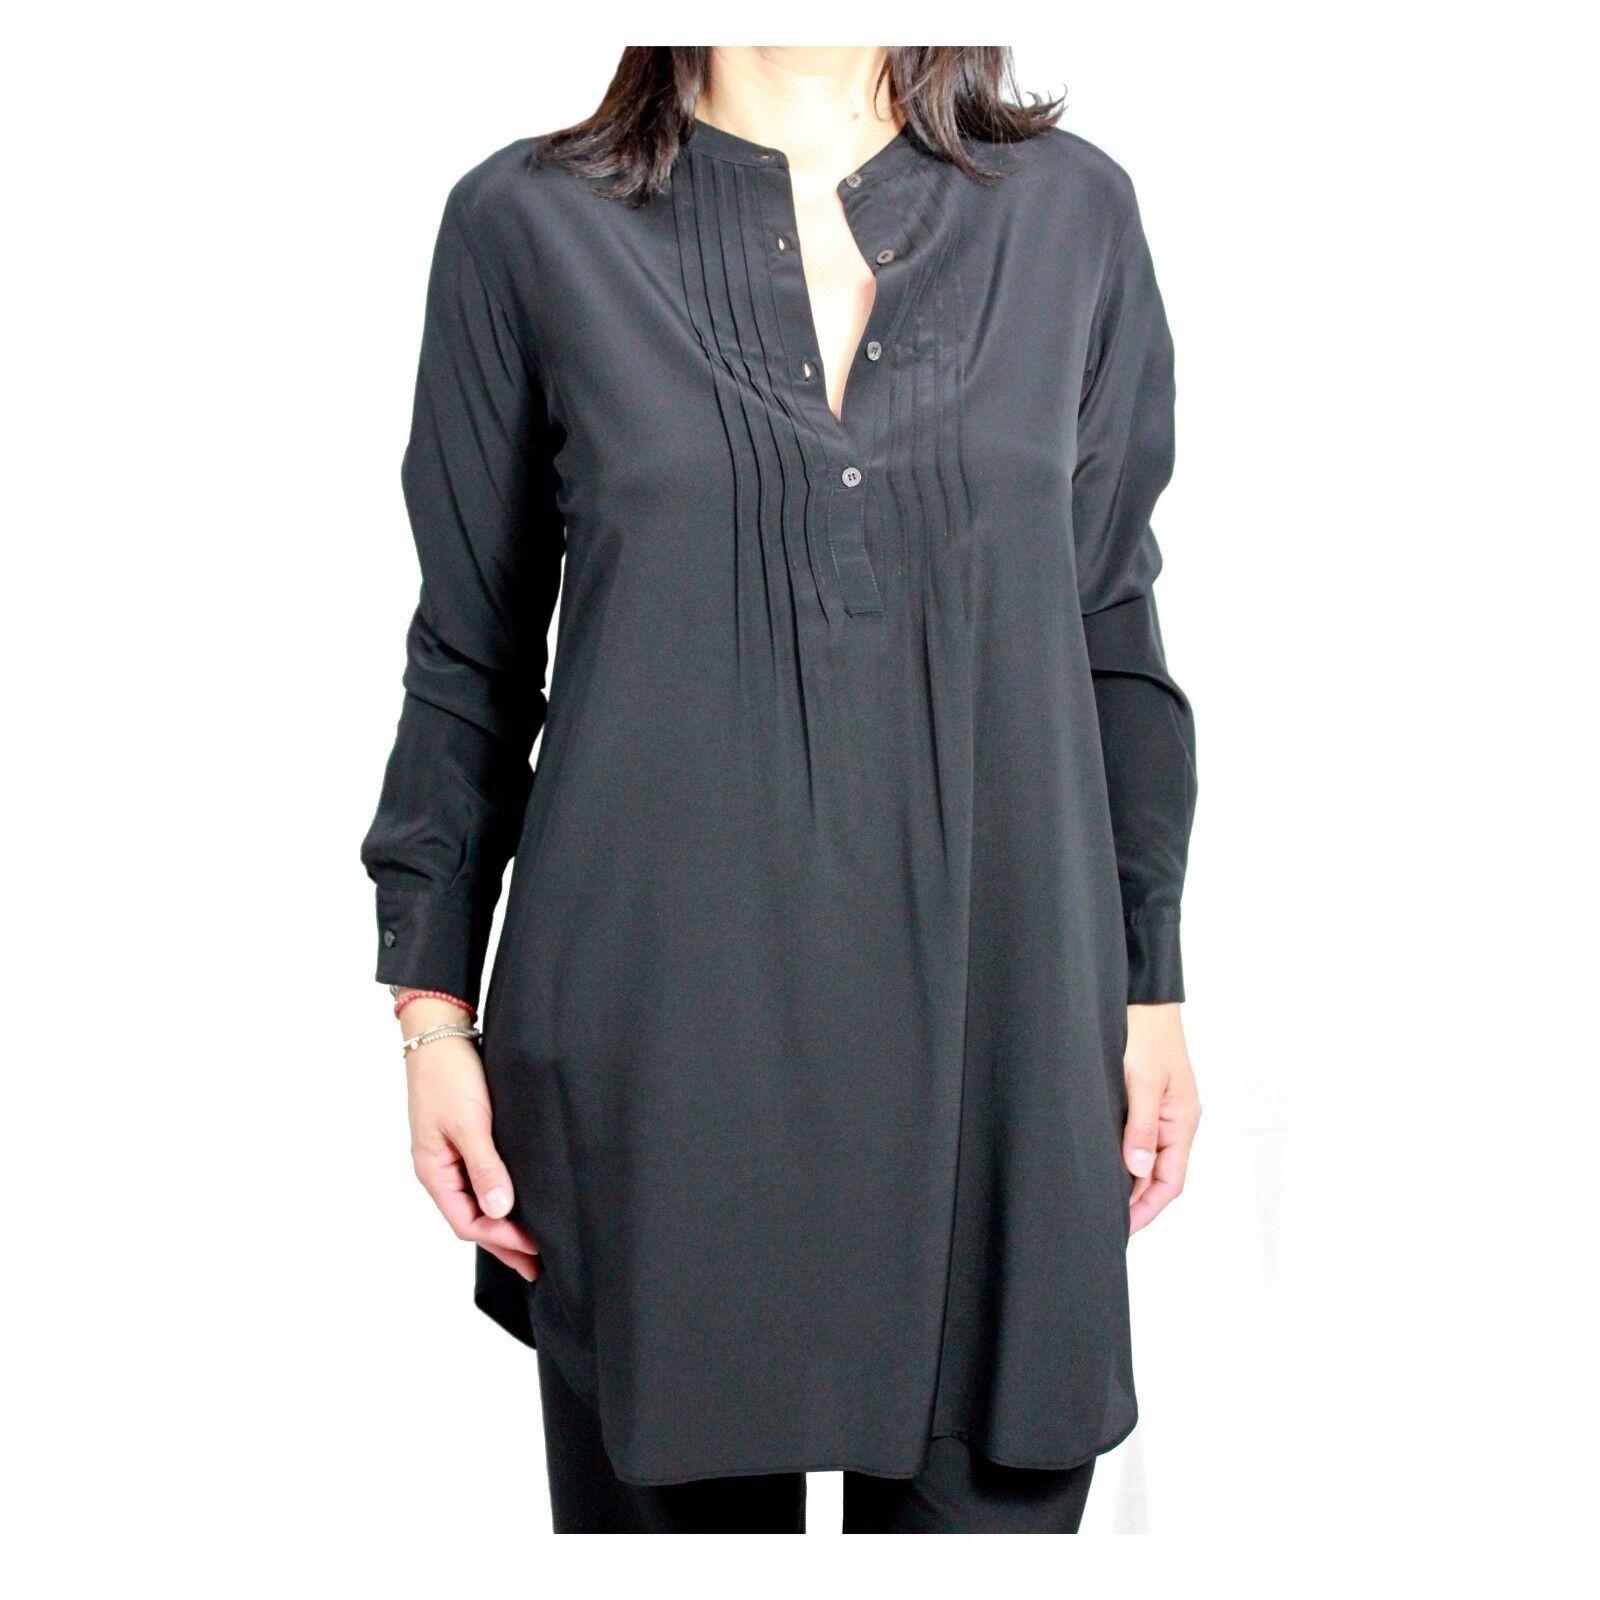 ASPESI Damenhemd lang schwarz mod H701 B753 100% Seide